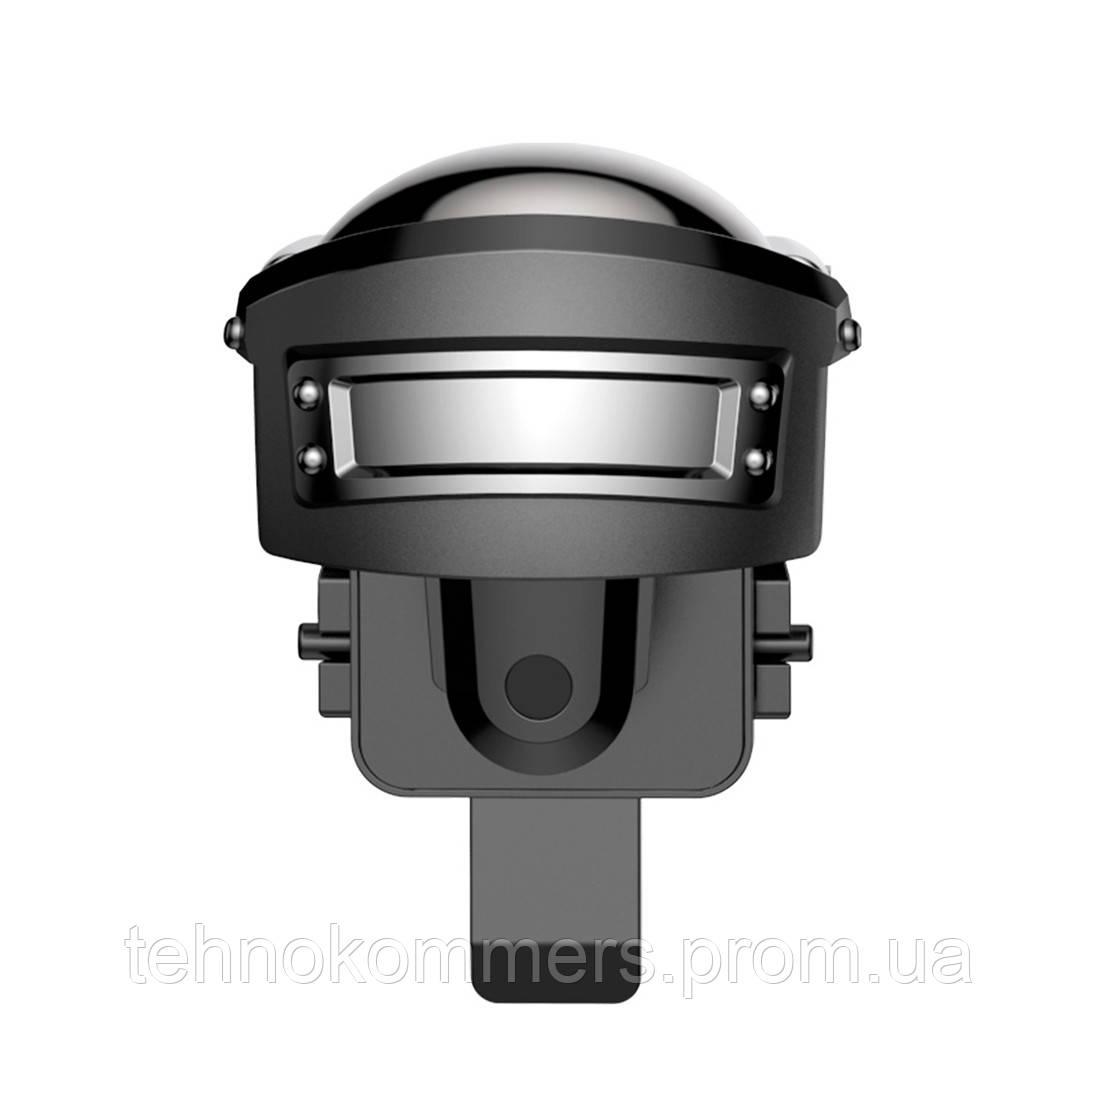 Ігровий контролер Baseus Level 3 Helmet PUBG GA03 Black